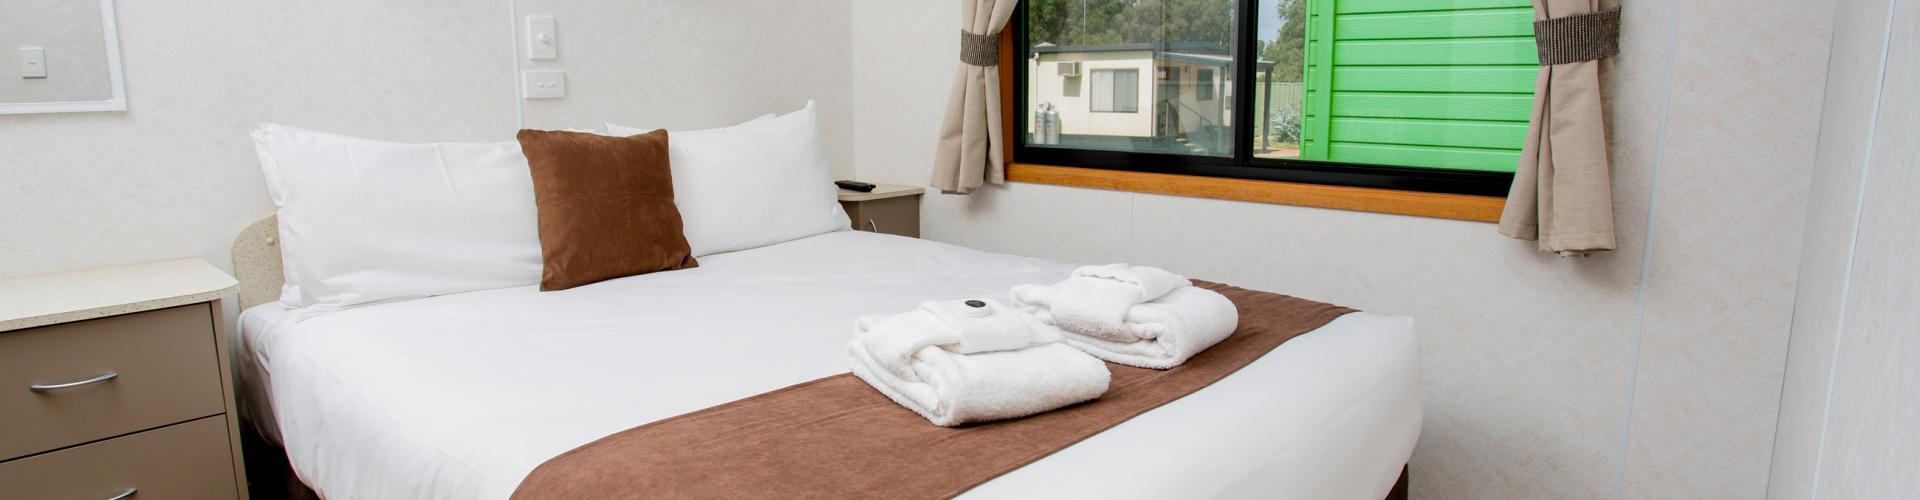 BIG4 Bendigo Park Lane Holiday Park - 2 Bedroom Villa - Sleeps 5 - Bedroom 1